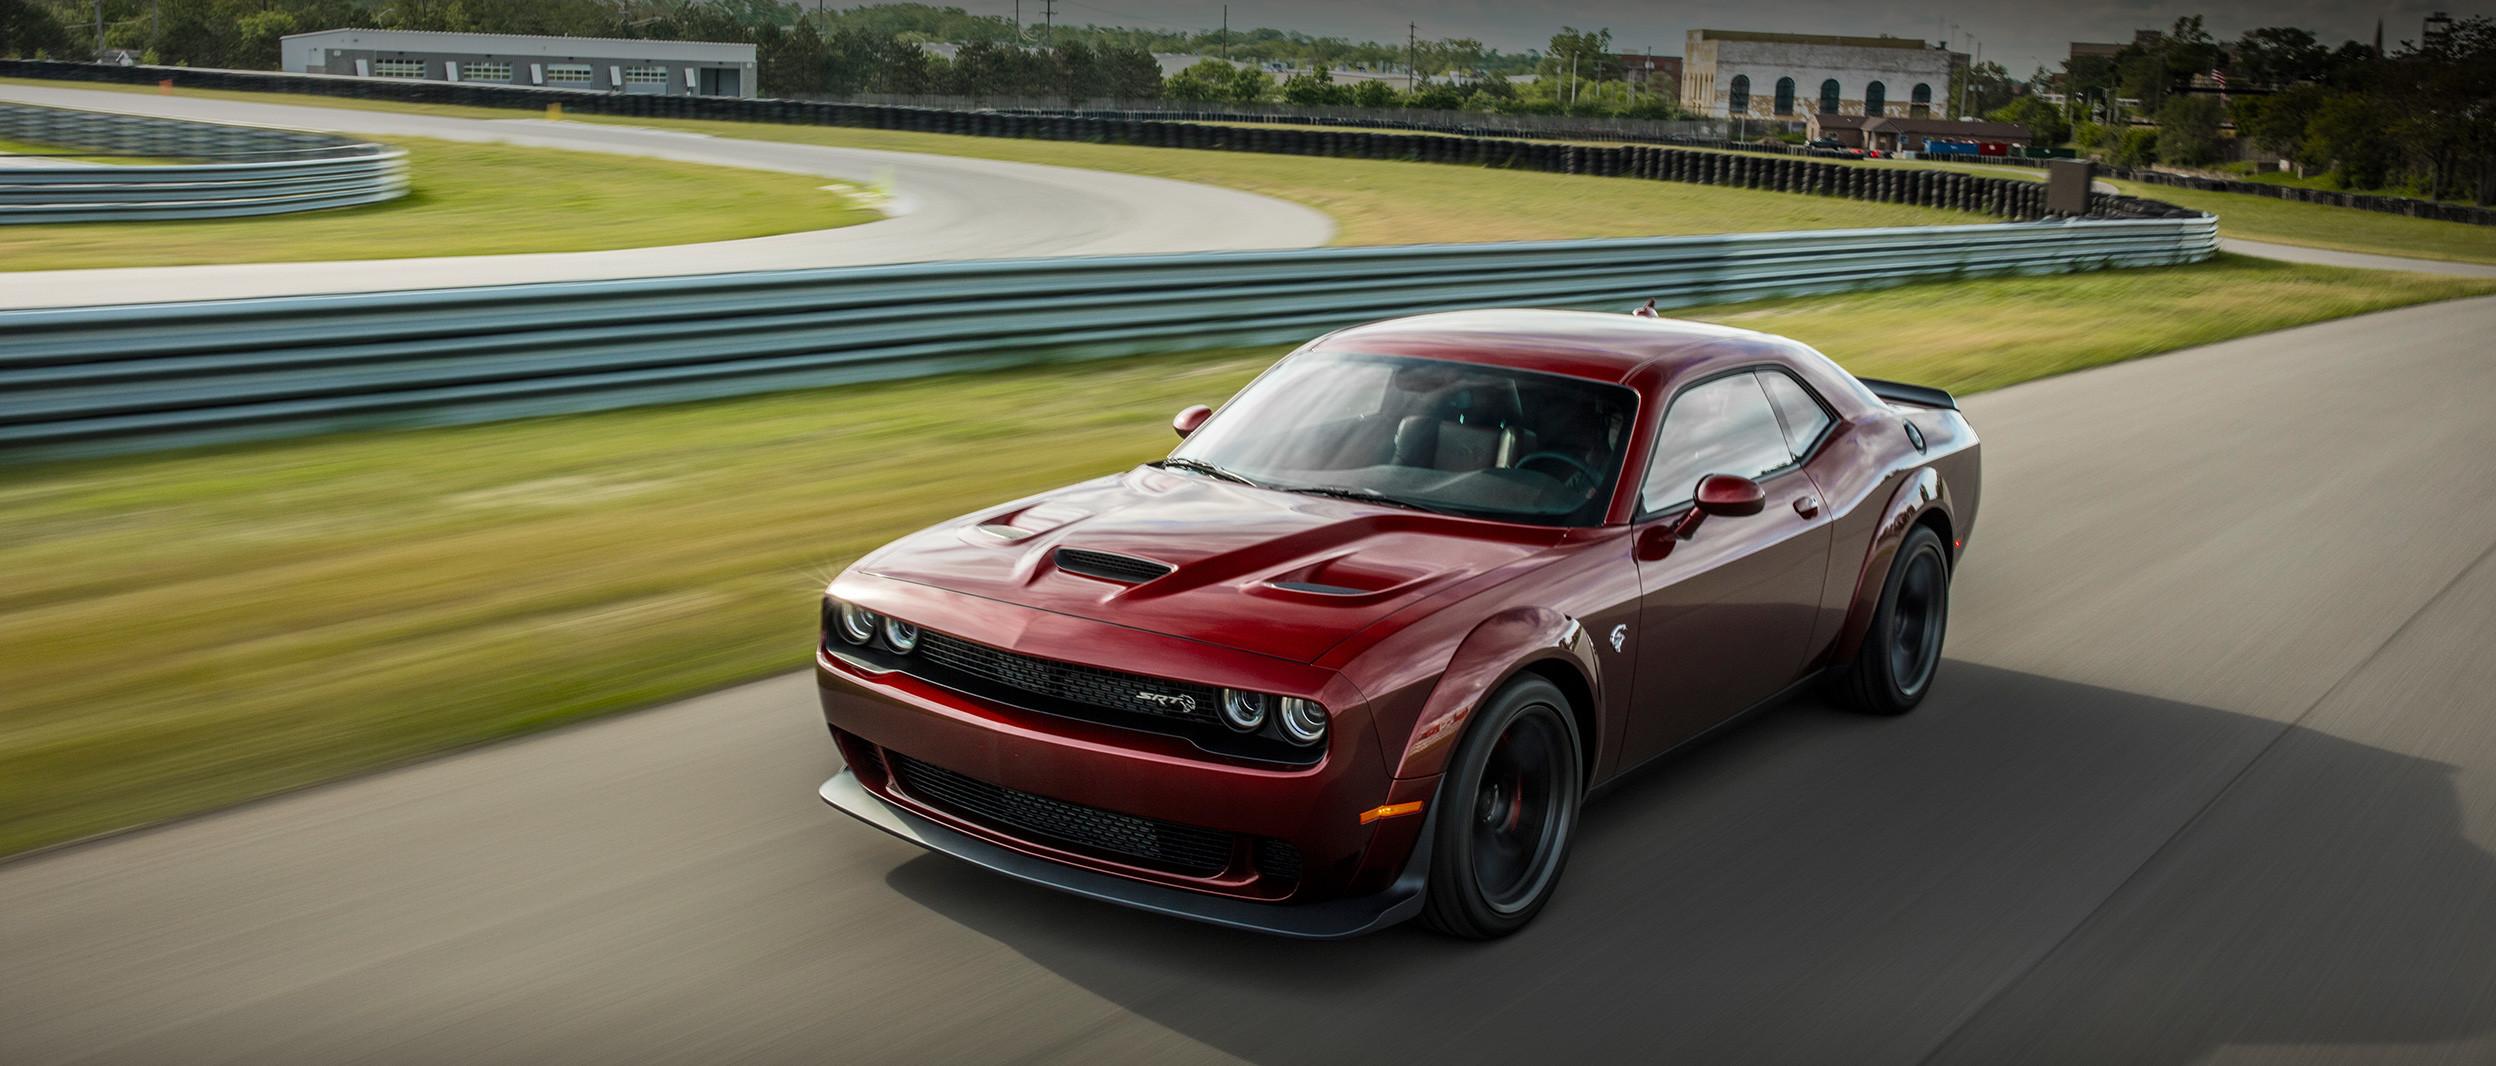 2018 Dodge Challenger | Dodge Canada